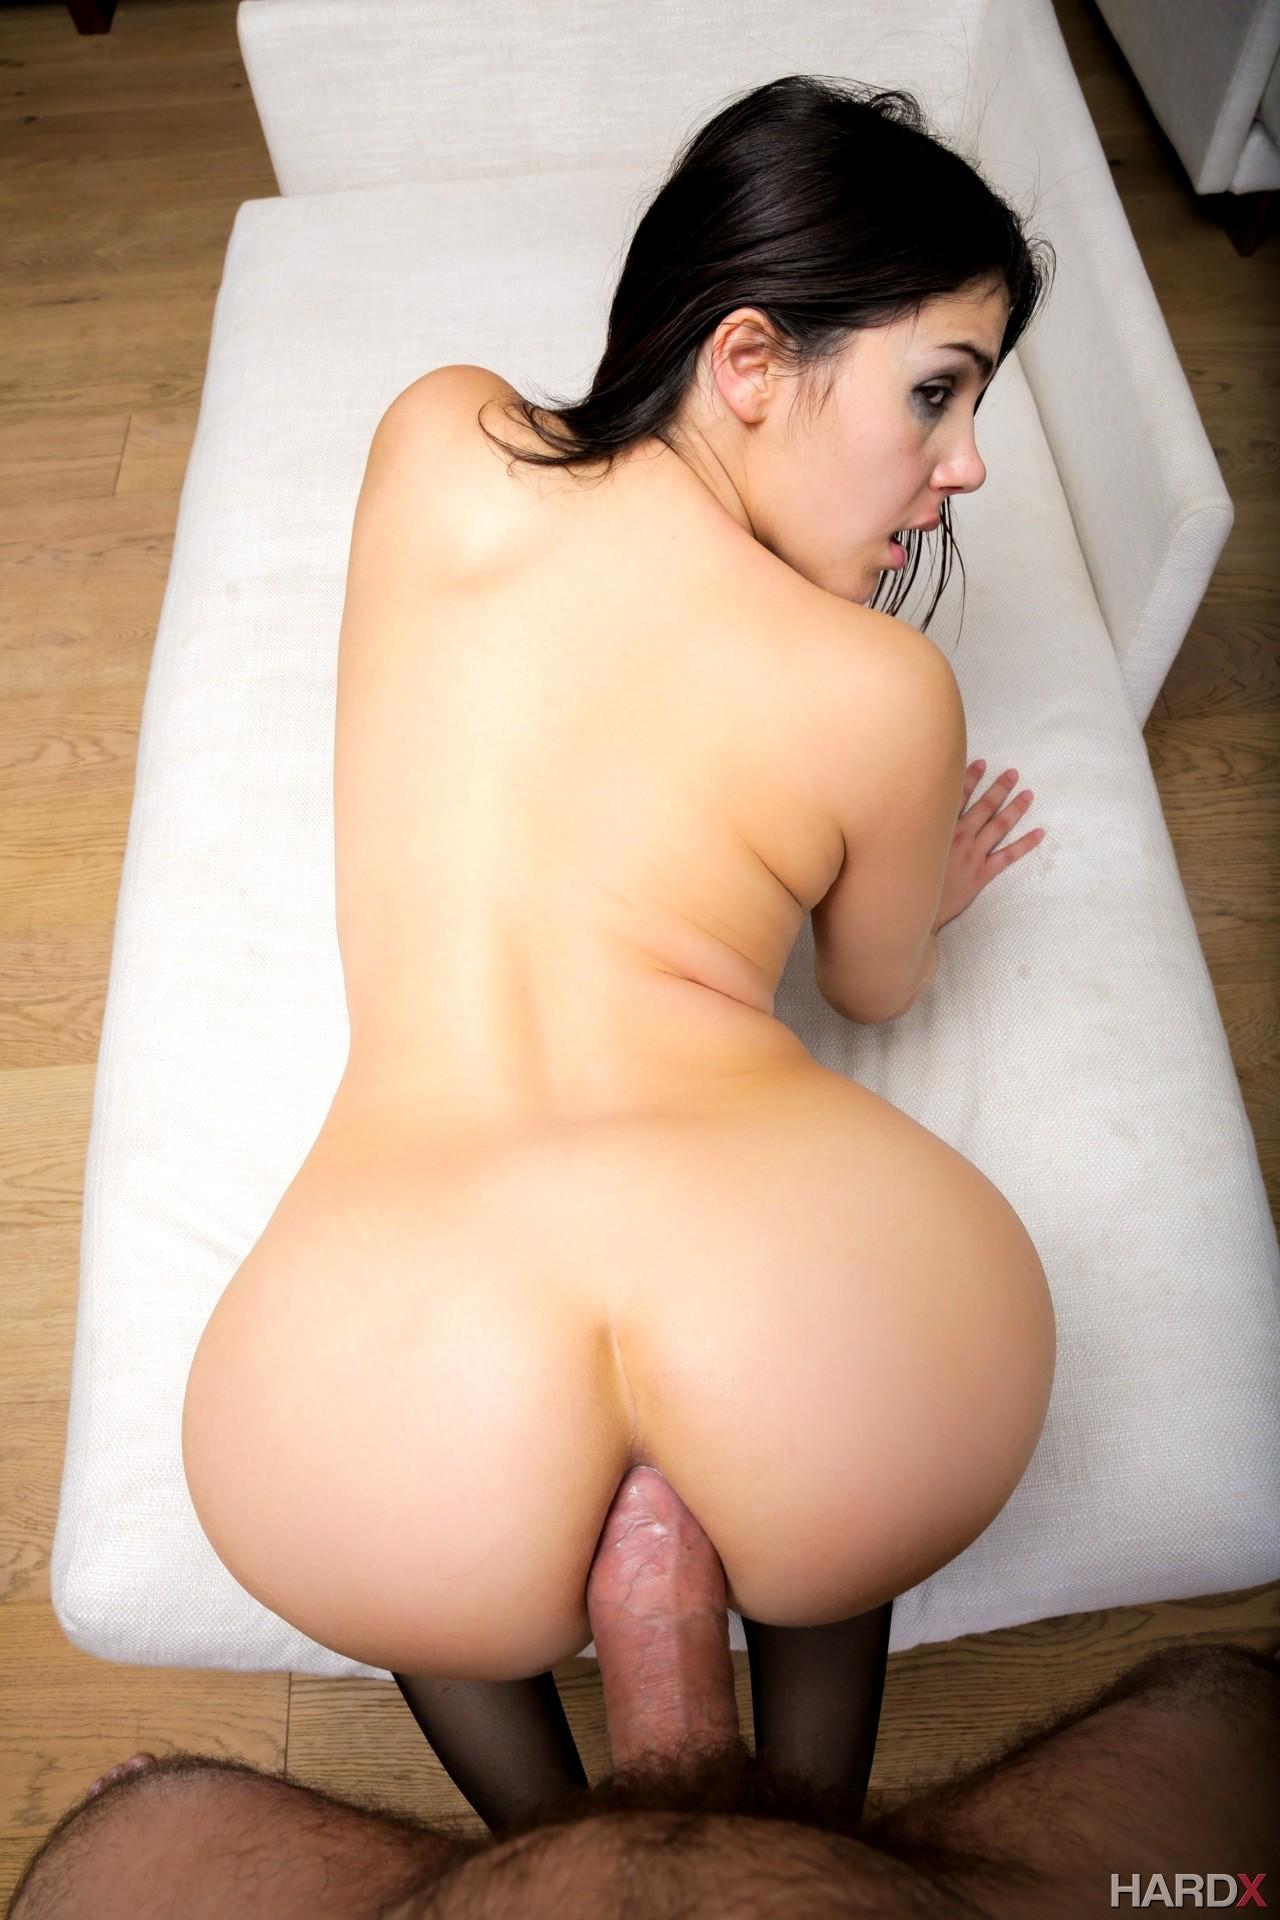 Pov sex tube